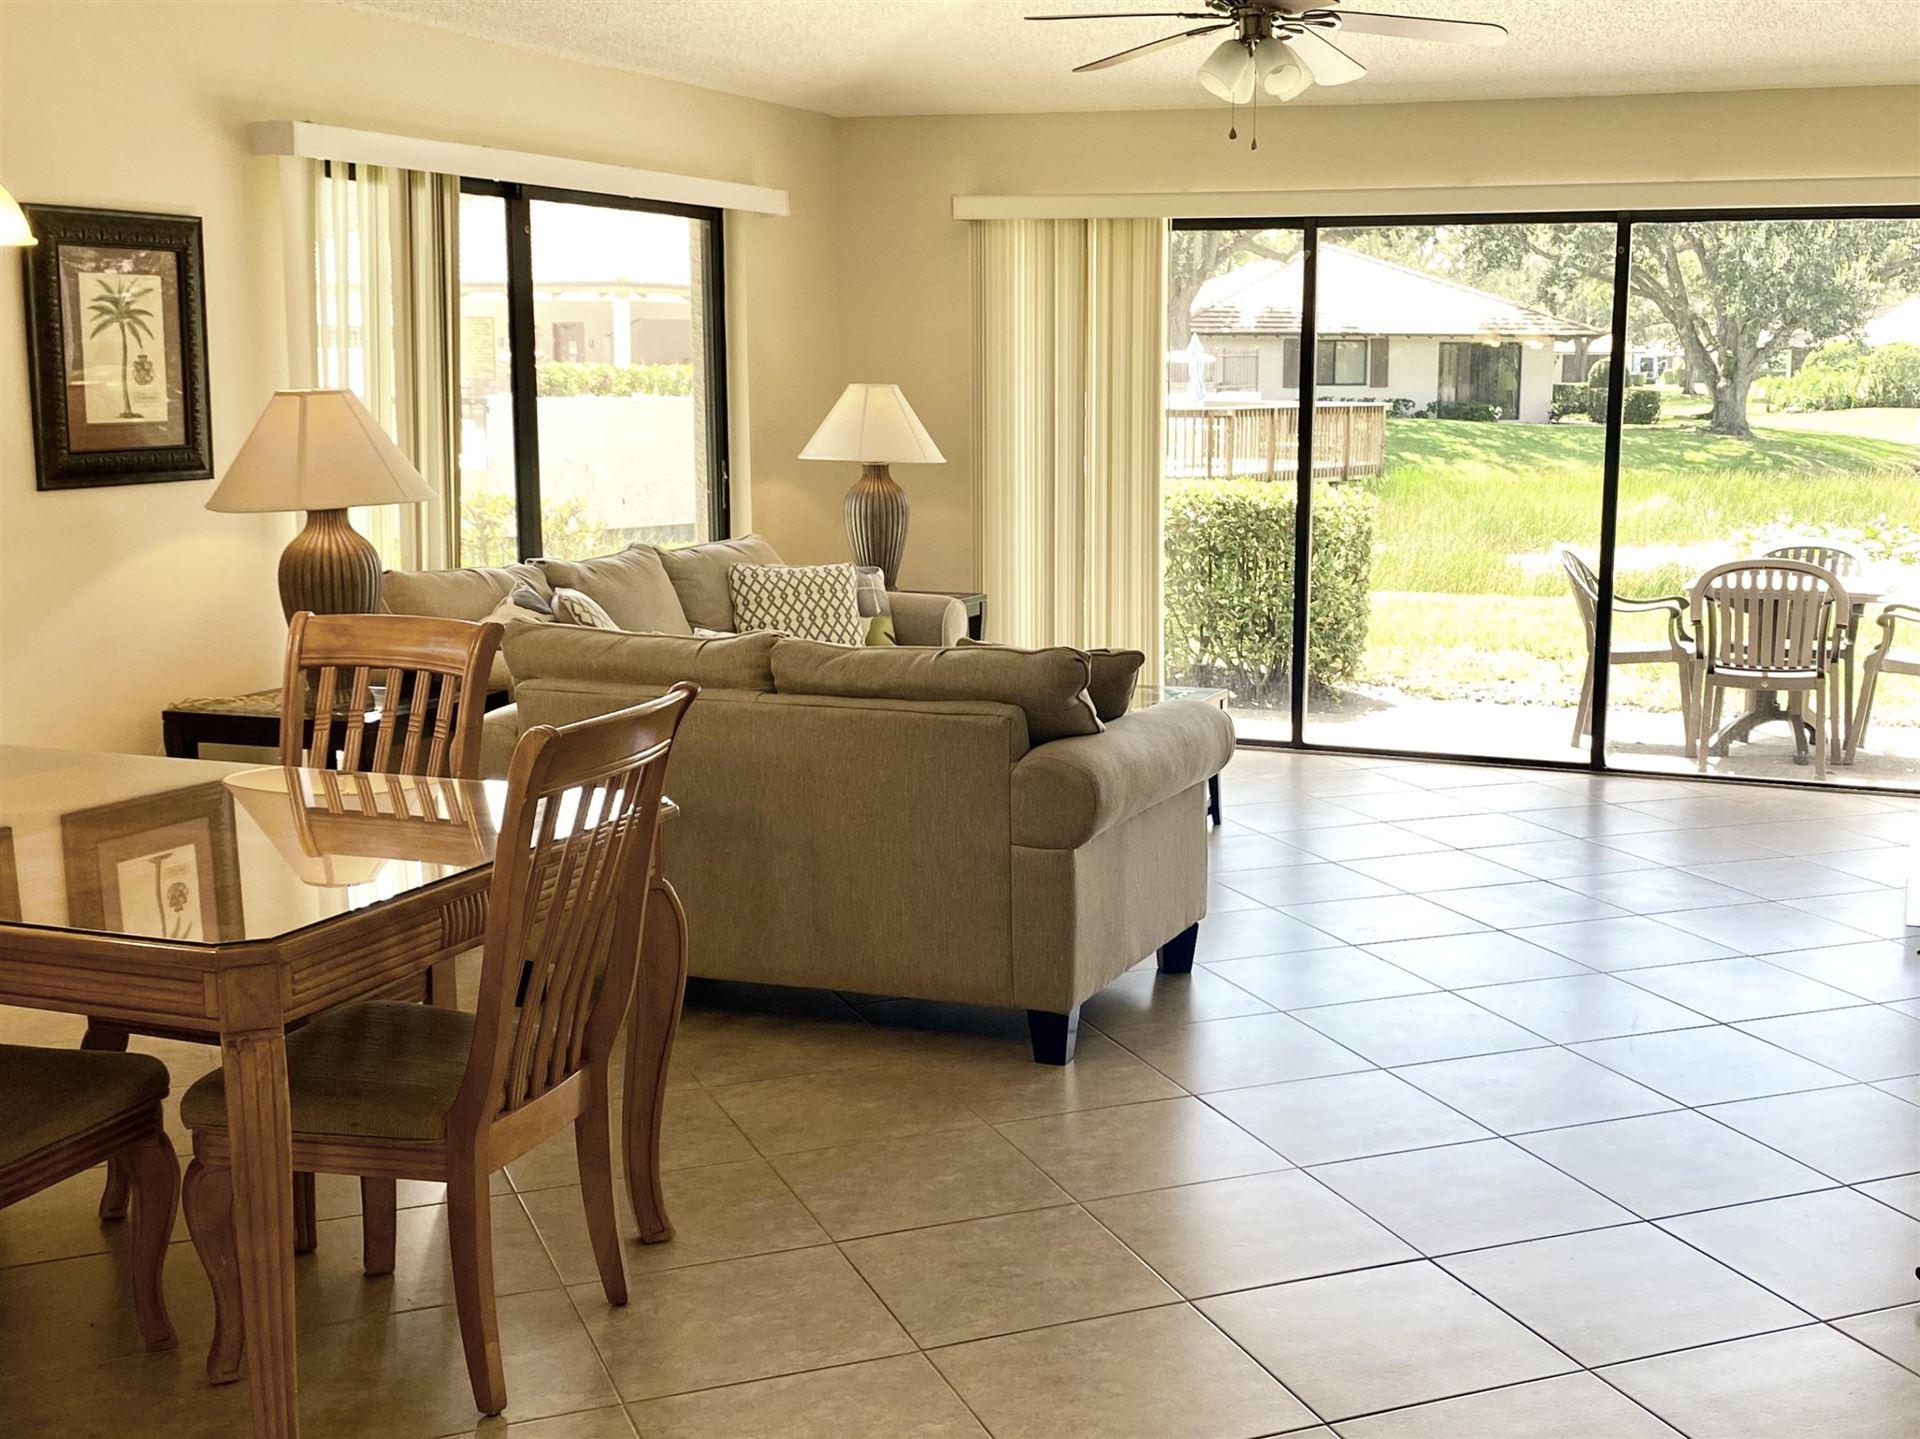 Photo of 205 Club Drive, Palm Beach Gardens, FL 33418 (MLS # RX-10653416)